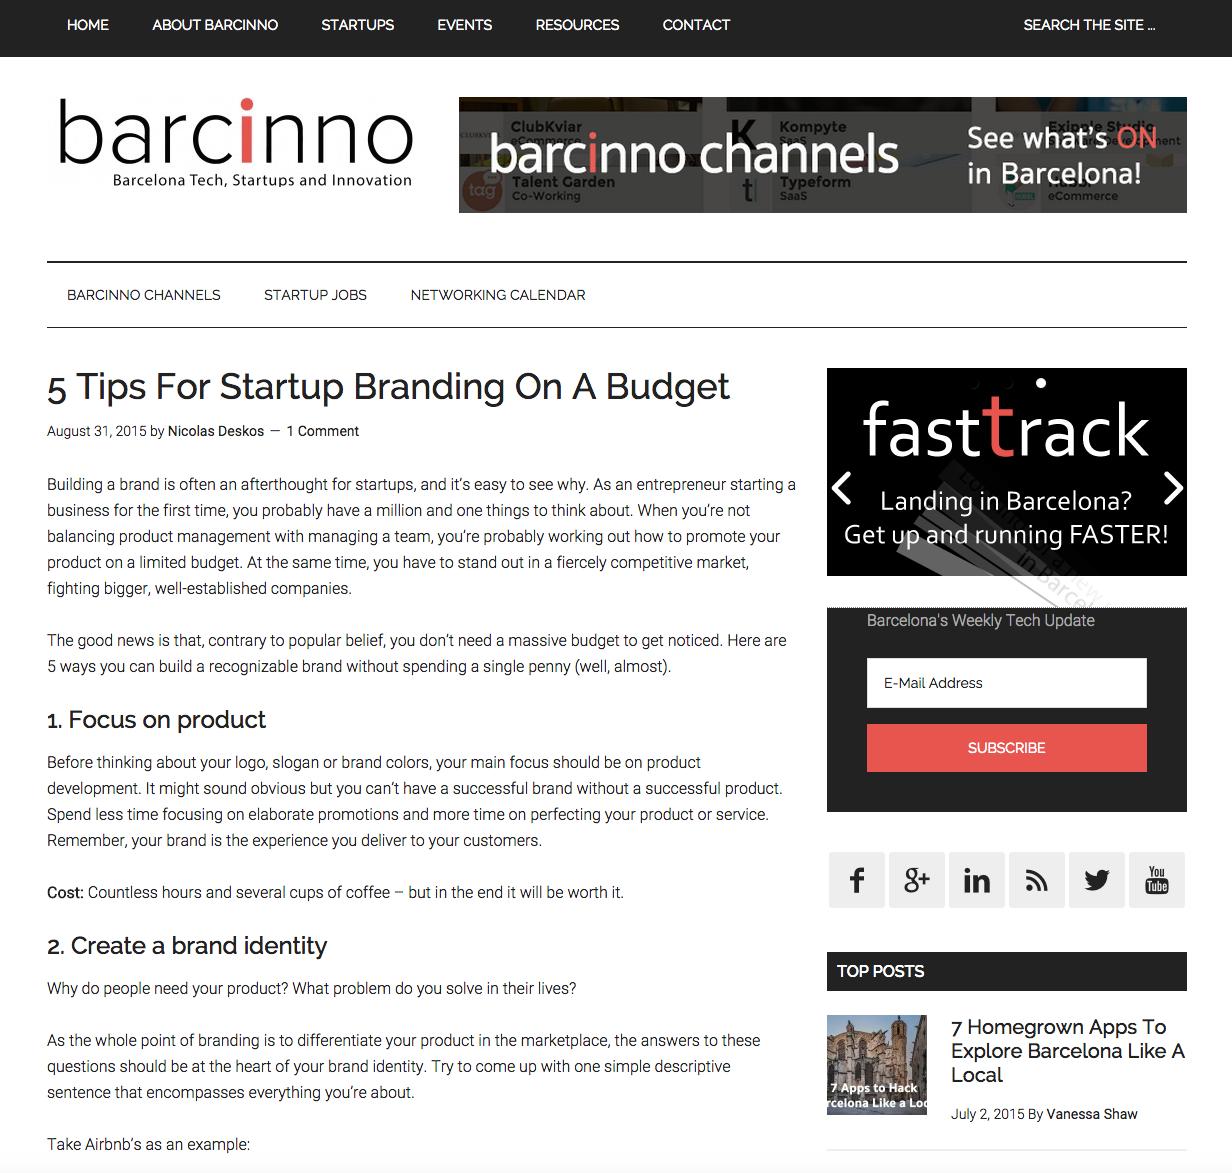 barcinno 5 tips startup branding budget